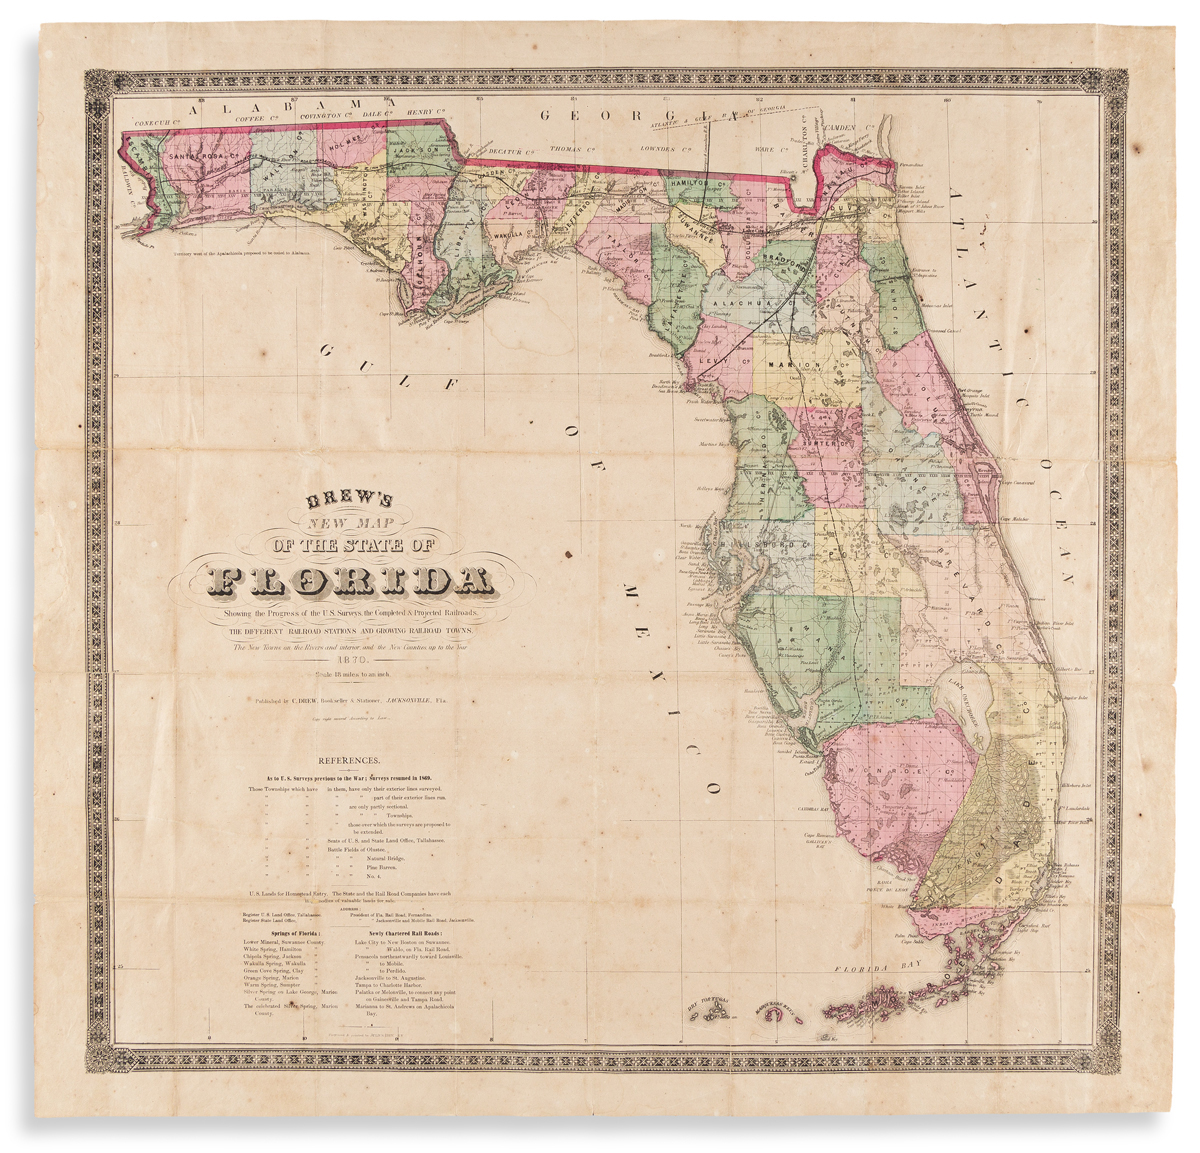 (FLORIDA.) Columbus Drew. Drews New Map of the State of Florida.